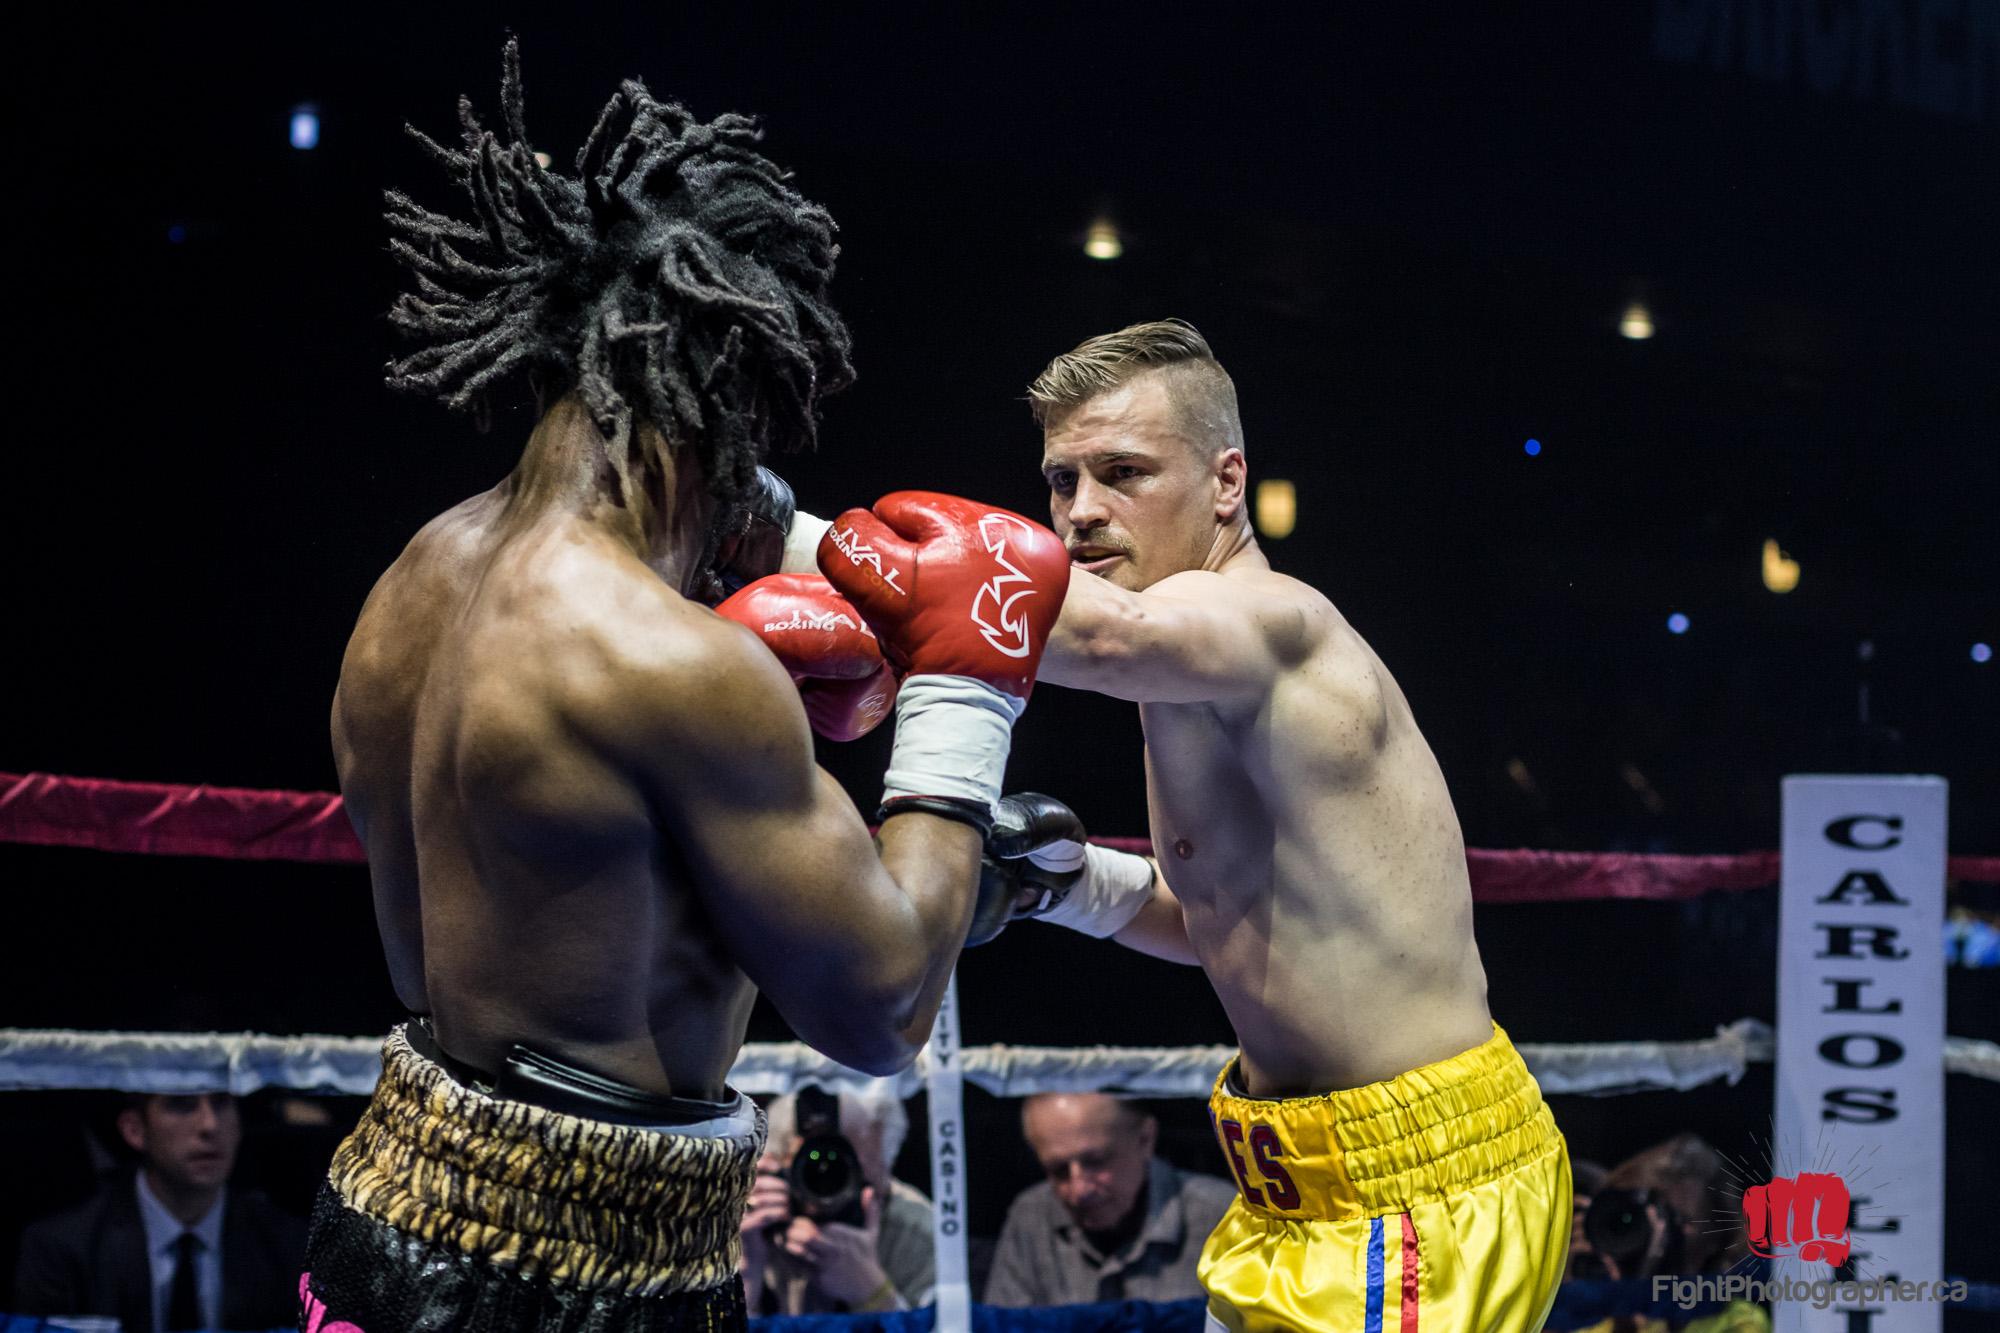 Professional Boxer Anthony Barnes